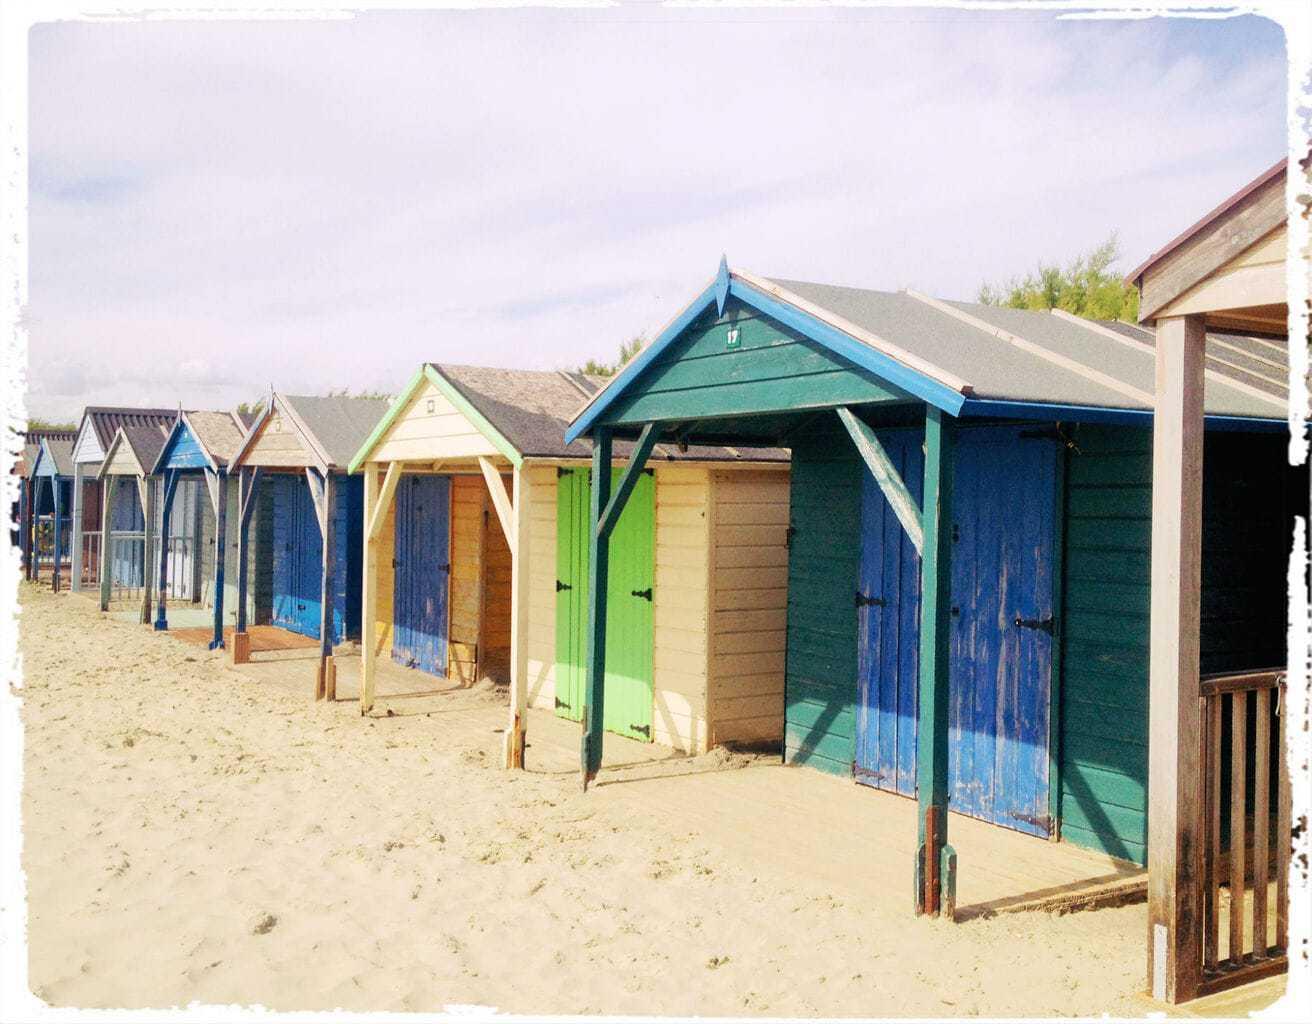 West Wittering Beach, West Sussex